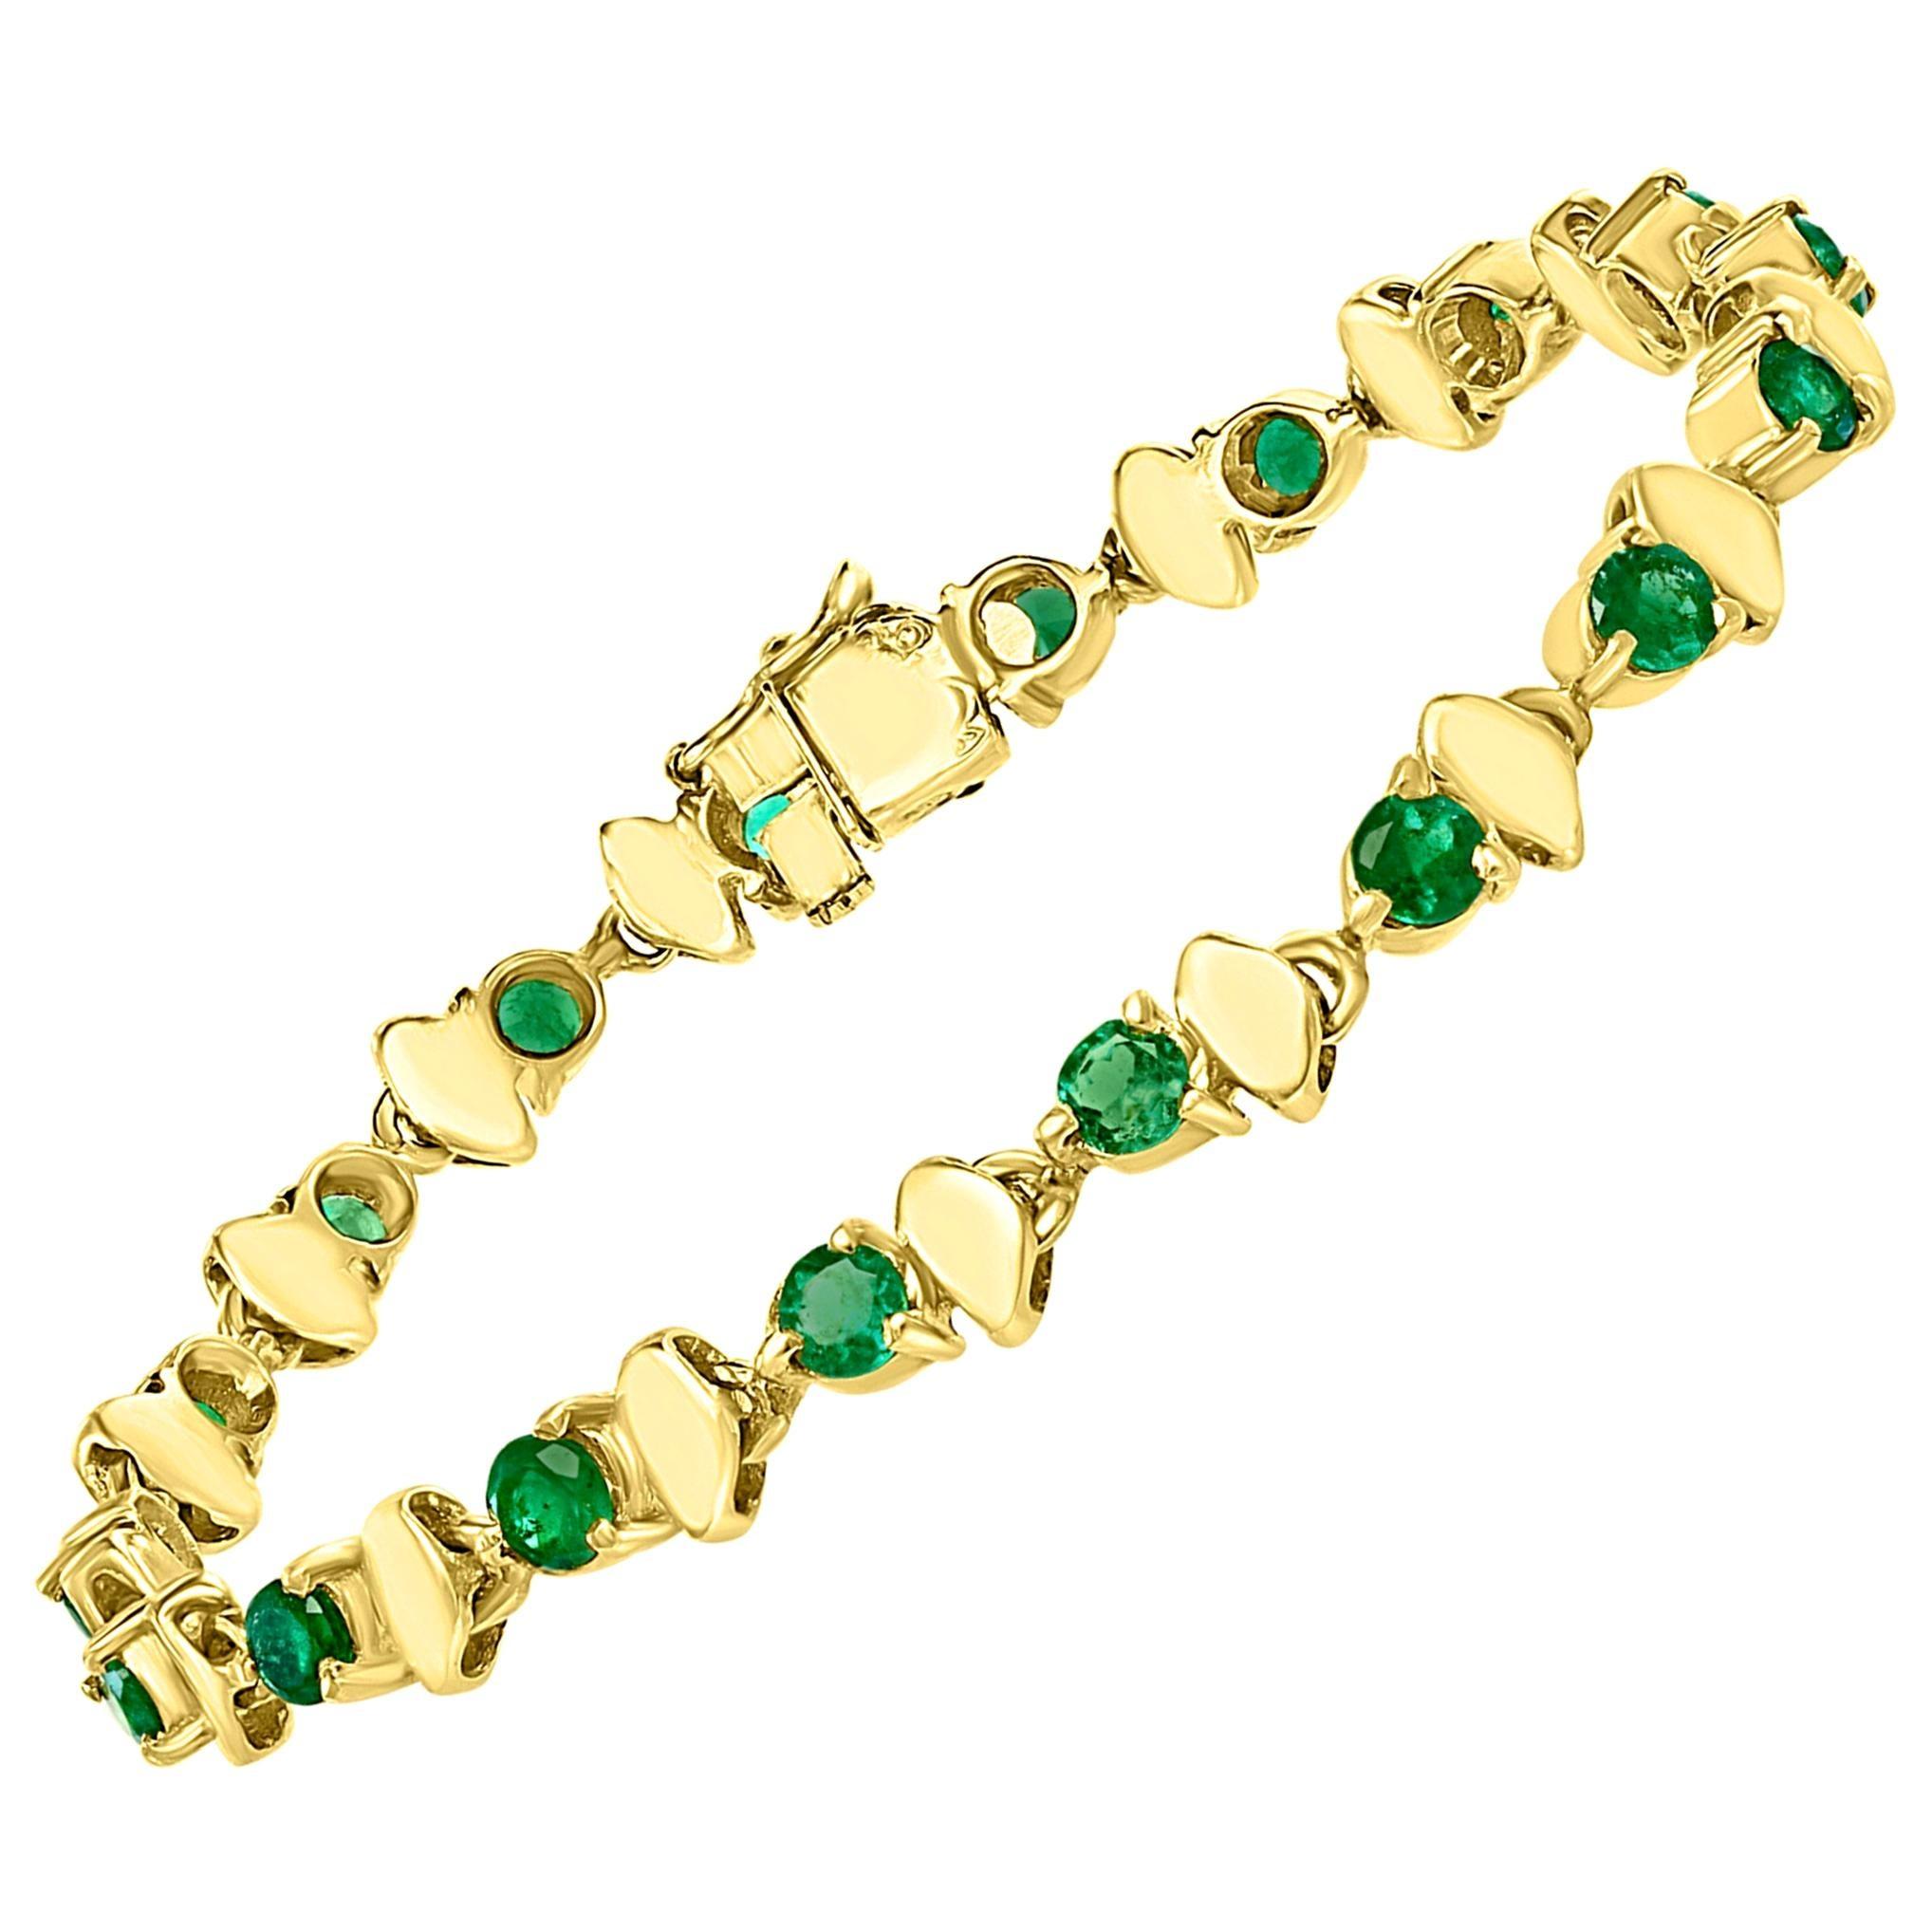 6 Carat Colombian Round Emerald Tennis Bracelet 18 Karat Yellow Gold